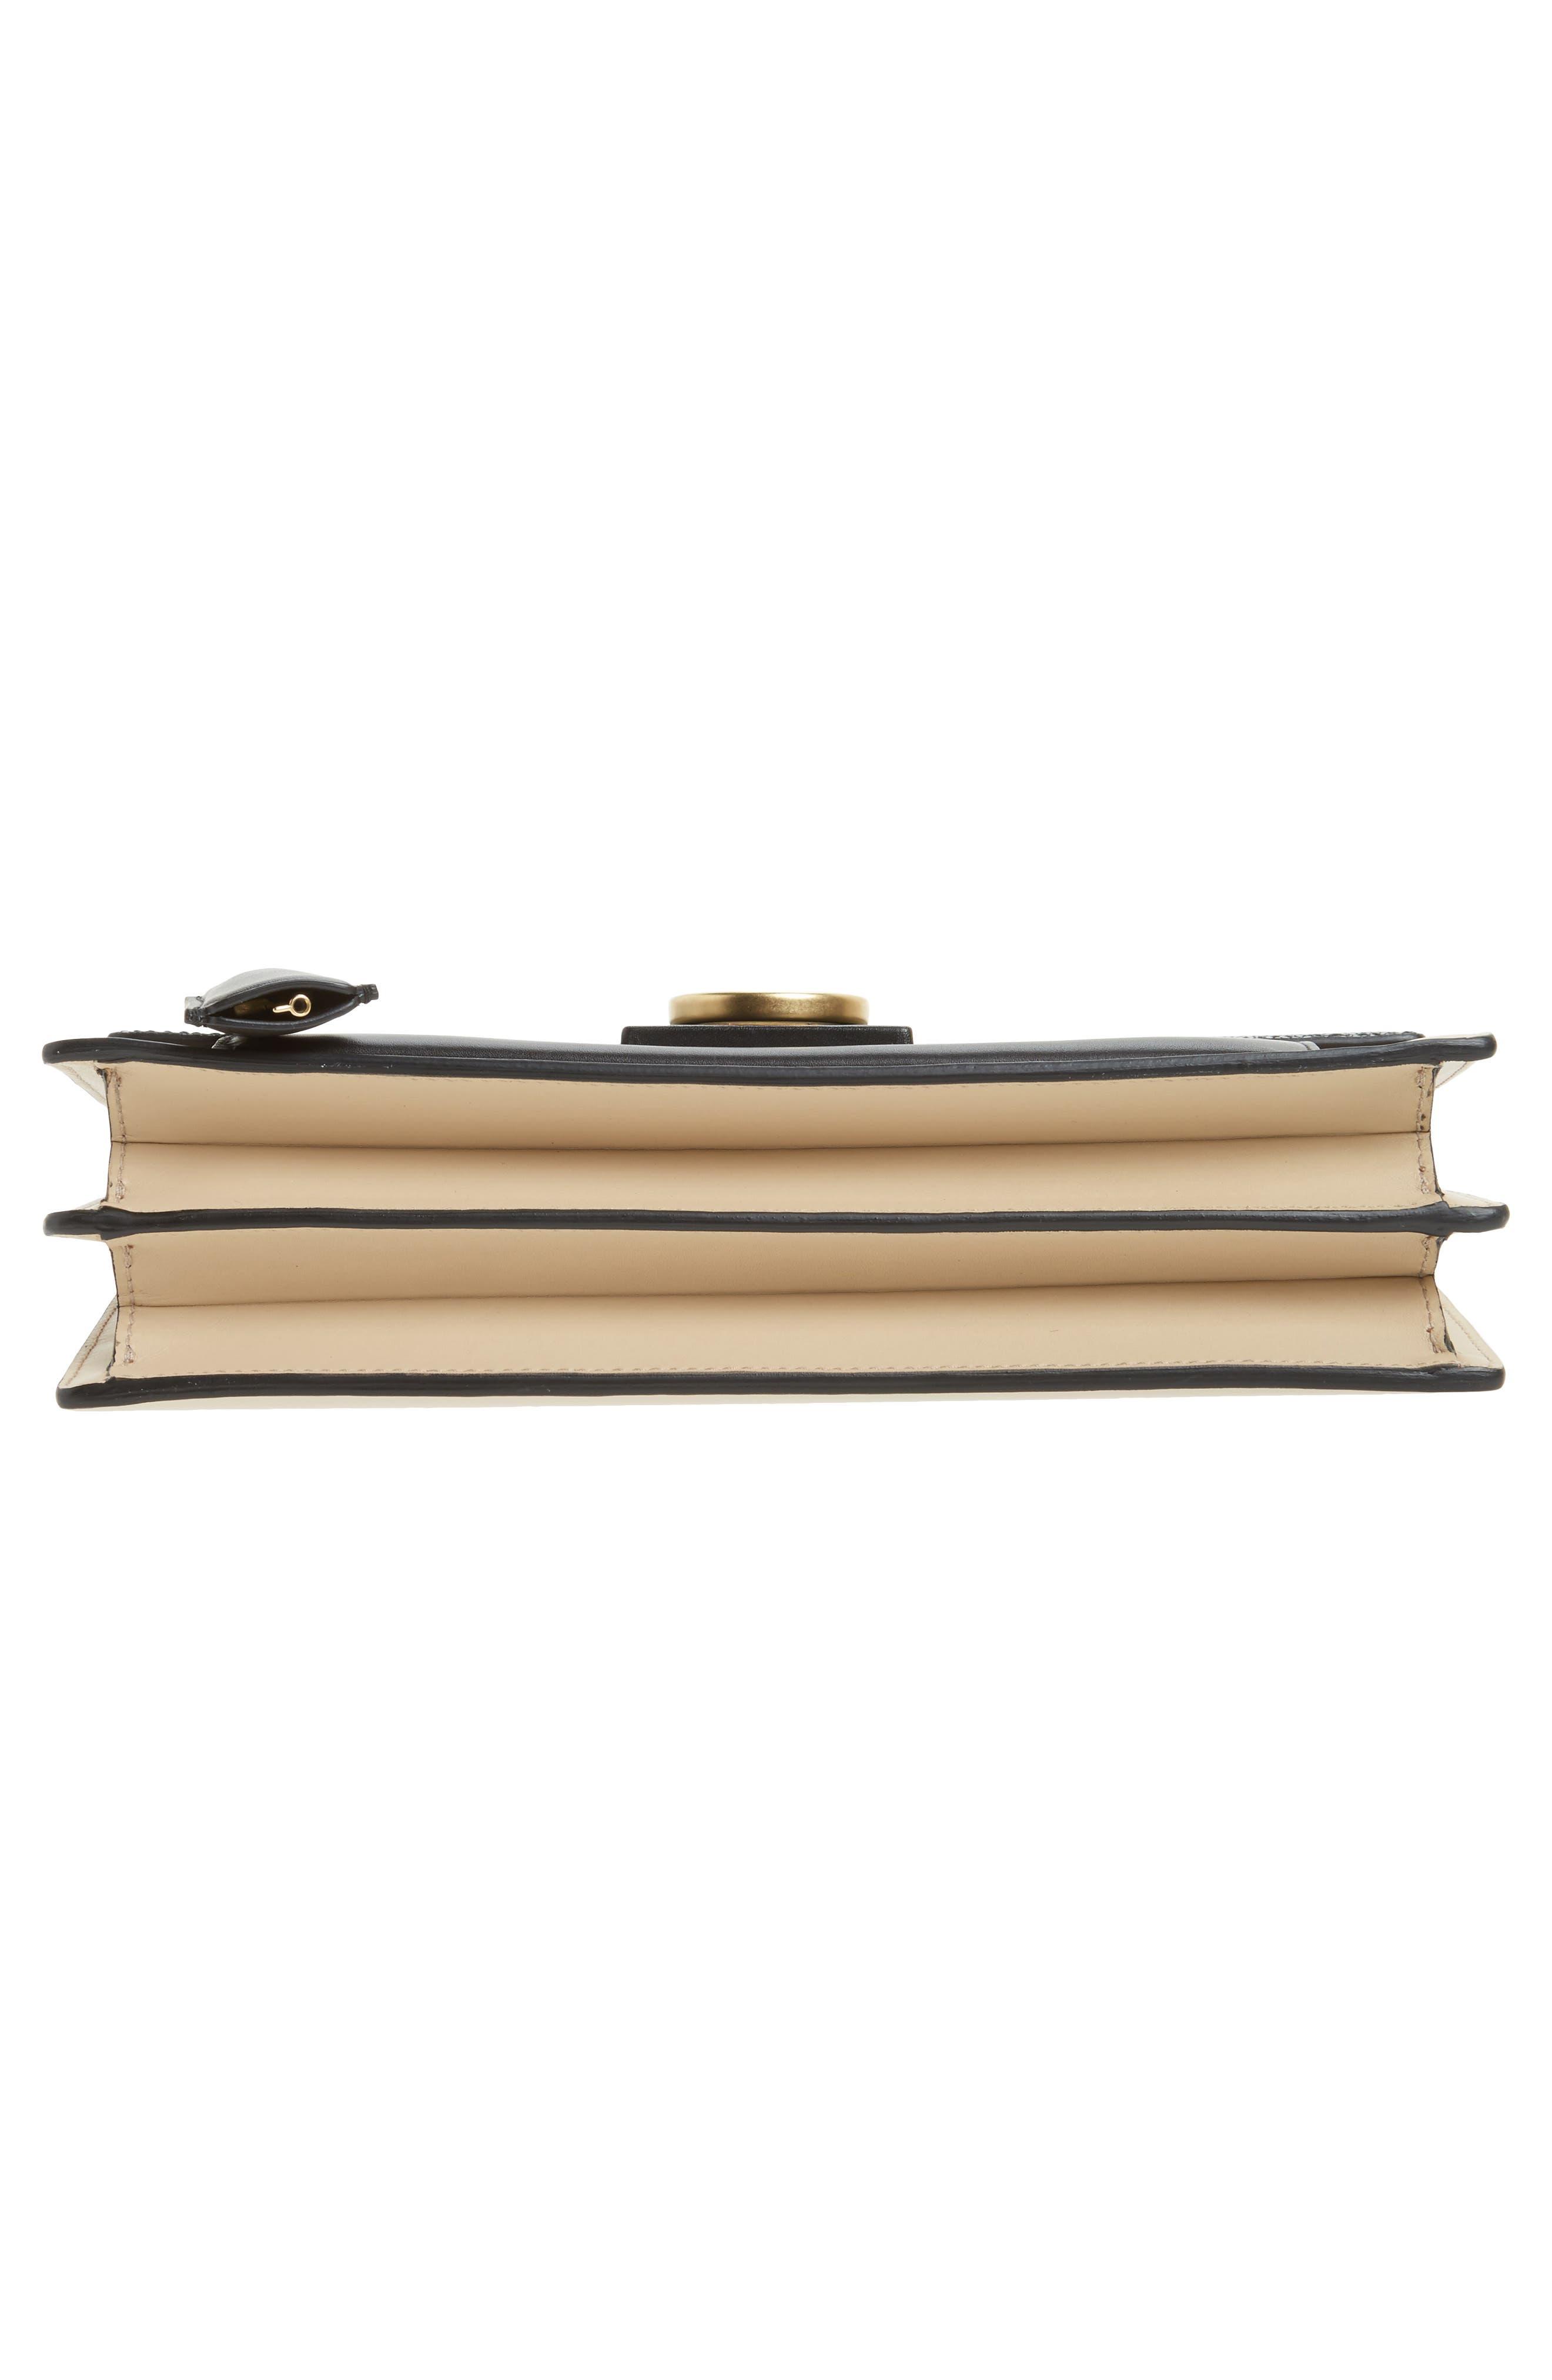 SALVATORE FERRAGAMO,                             Stingray Leather Shoulder Bag,                             Alternate thumbnail 6, color,                             974